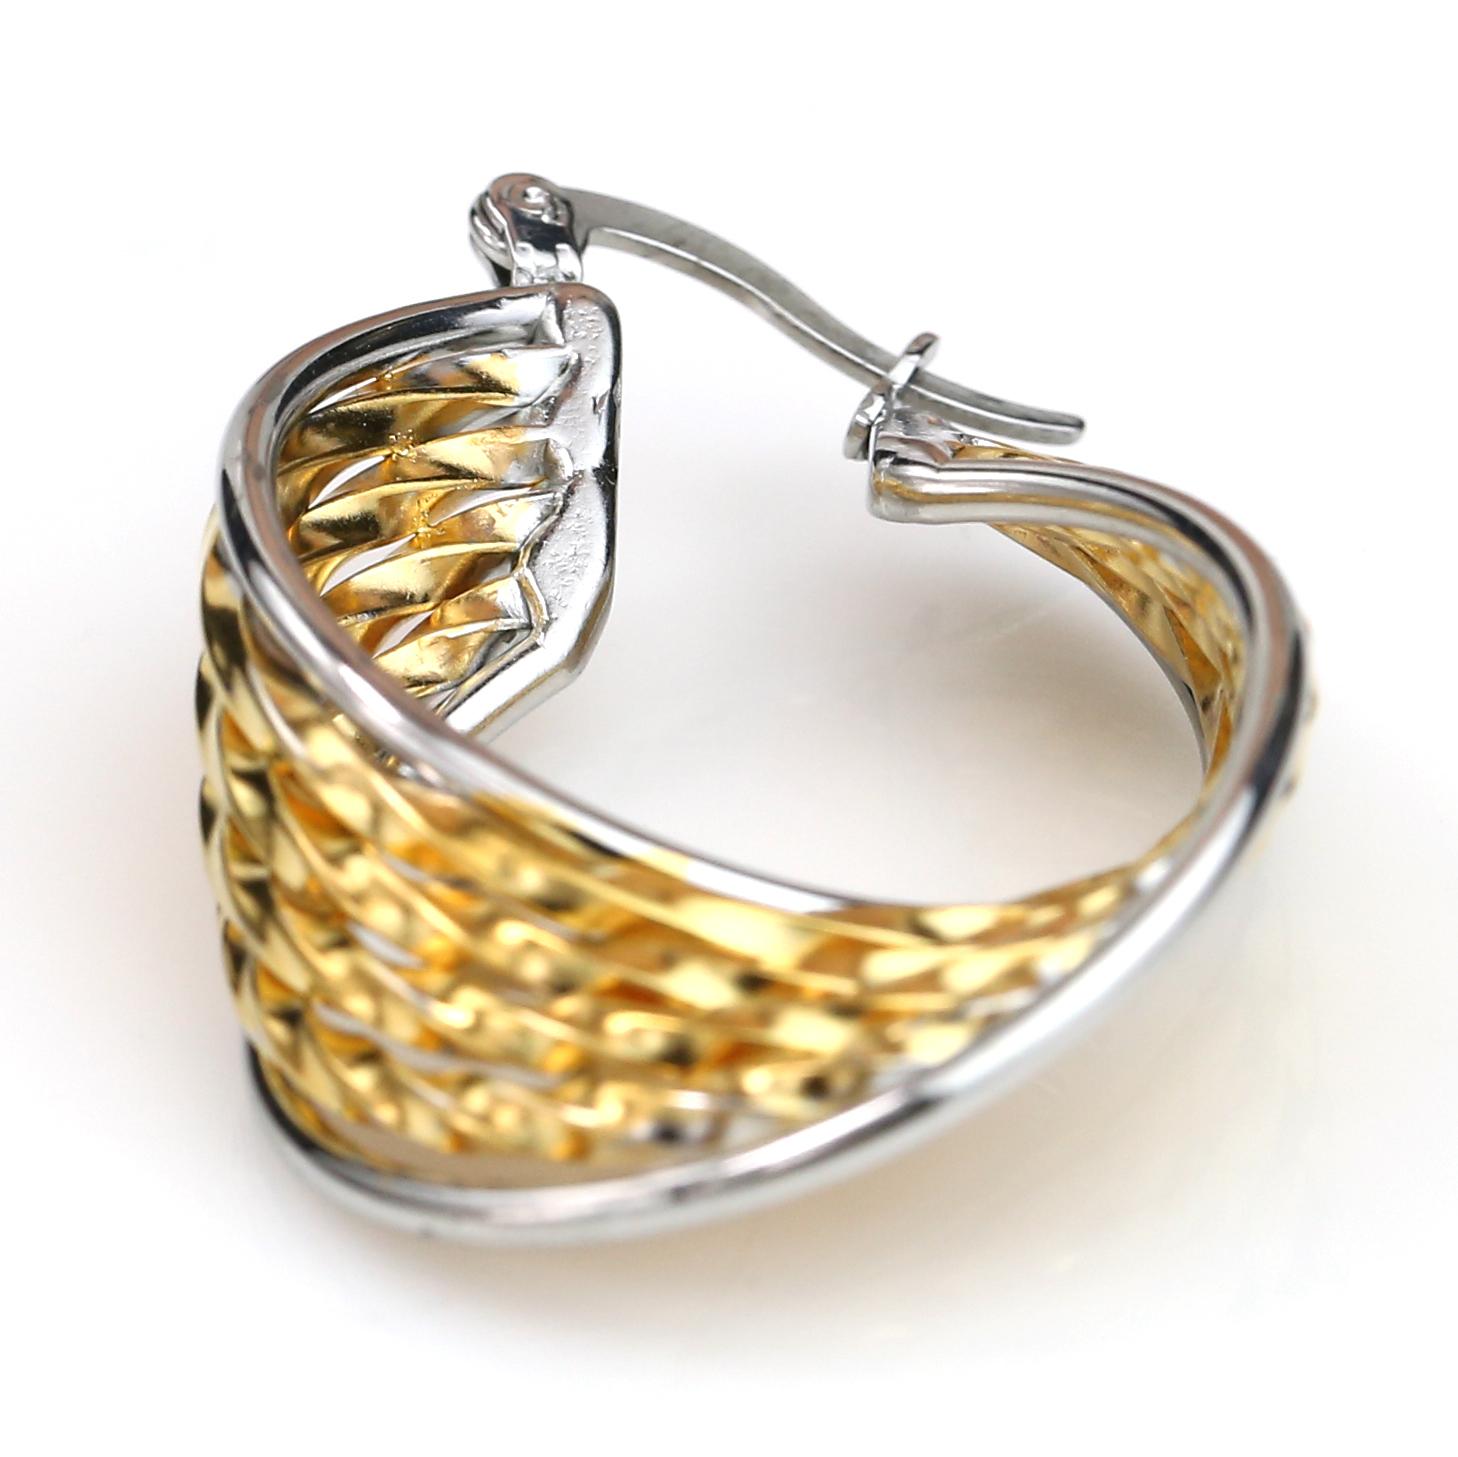 Trendy Twisted Gold & Silver Tone (Two Tone) Hoop Earrings- United Elegance